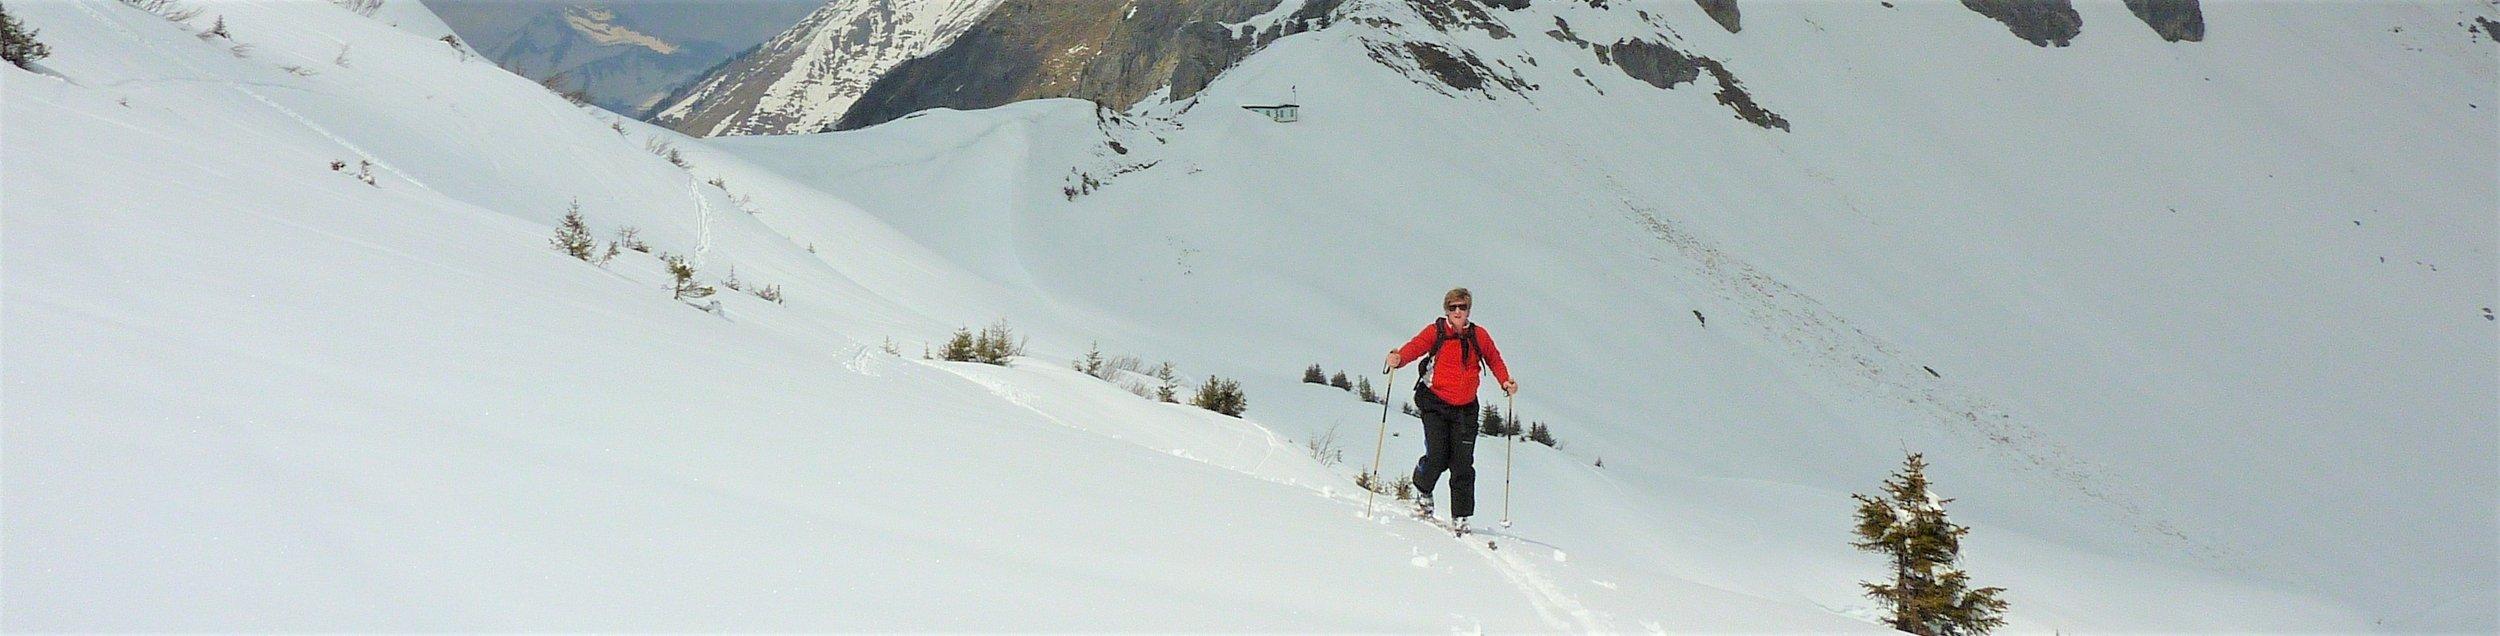 ski touring France Swiss border